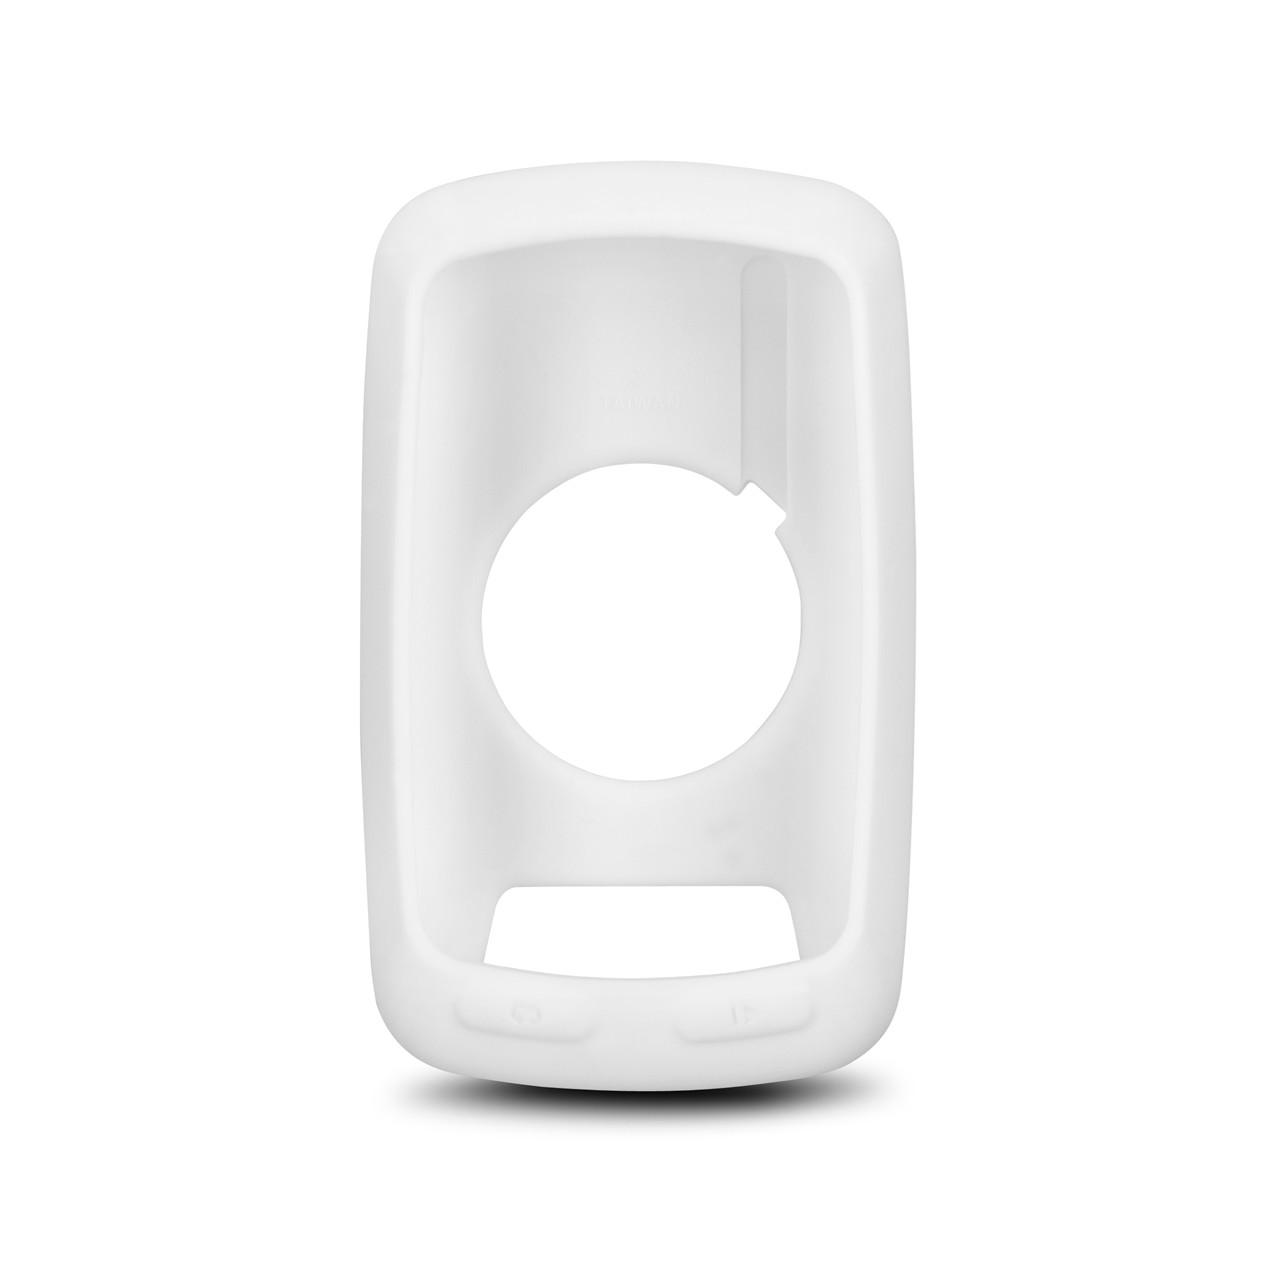 Garmin Edge 810 Silicone Cover (Hvid)